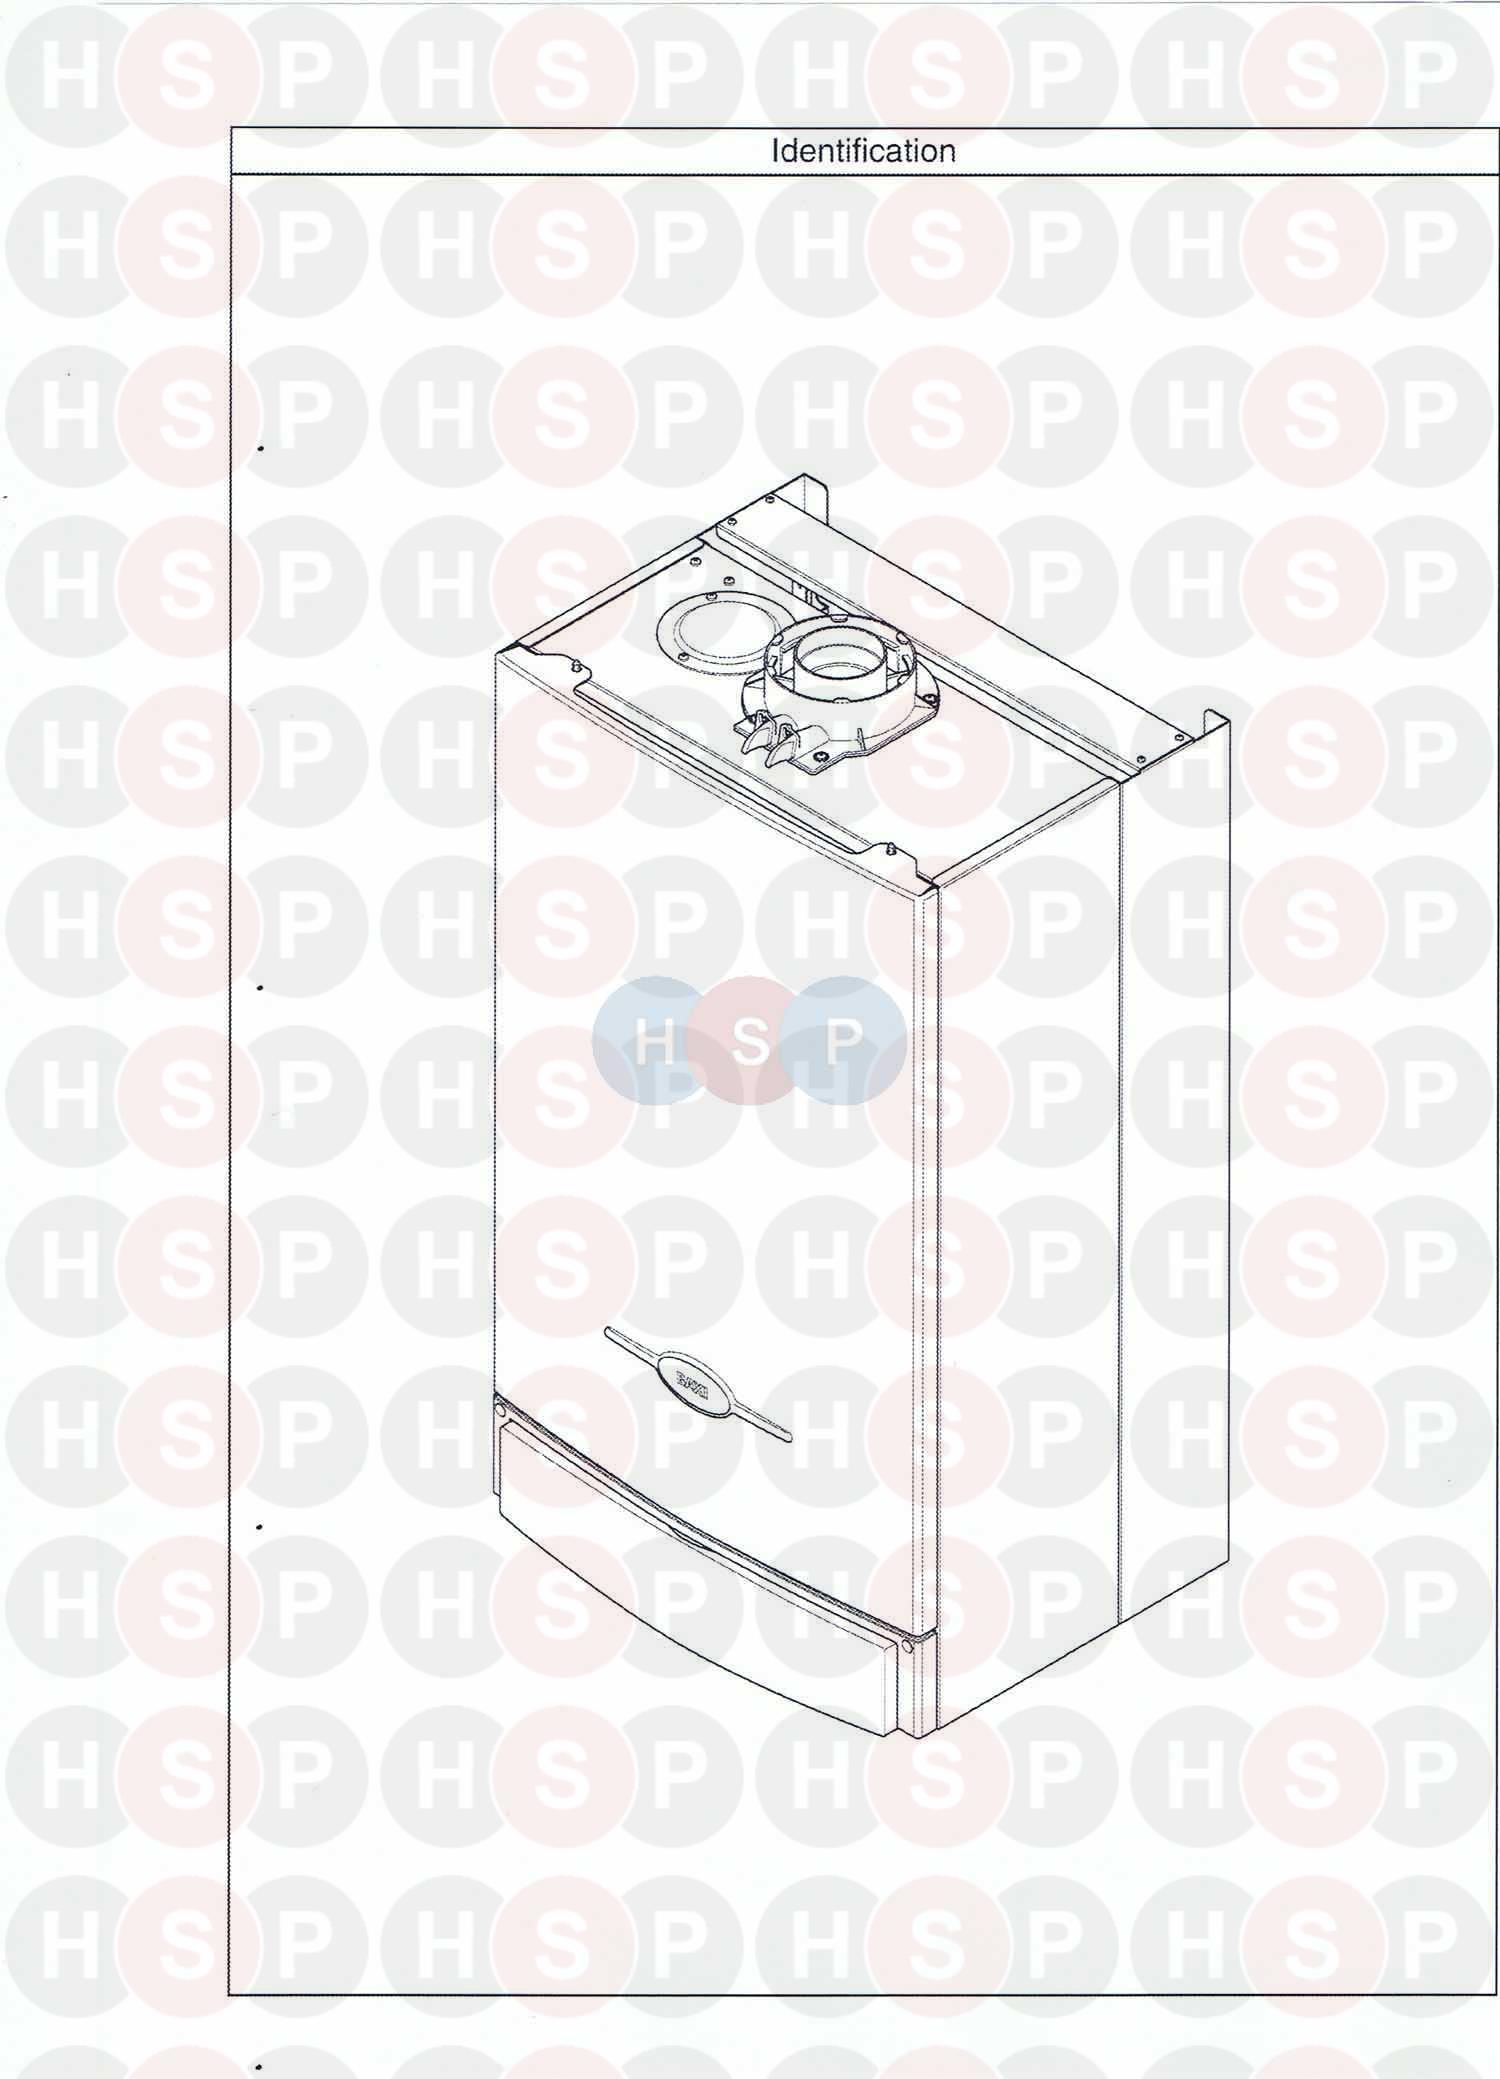 baxi combi 105he appliance diagram appliance overview. Black Bedroom Furniture Sets. Home Design Ideas